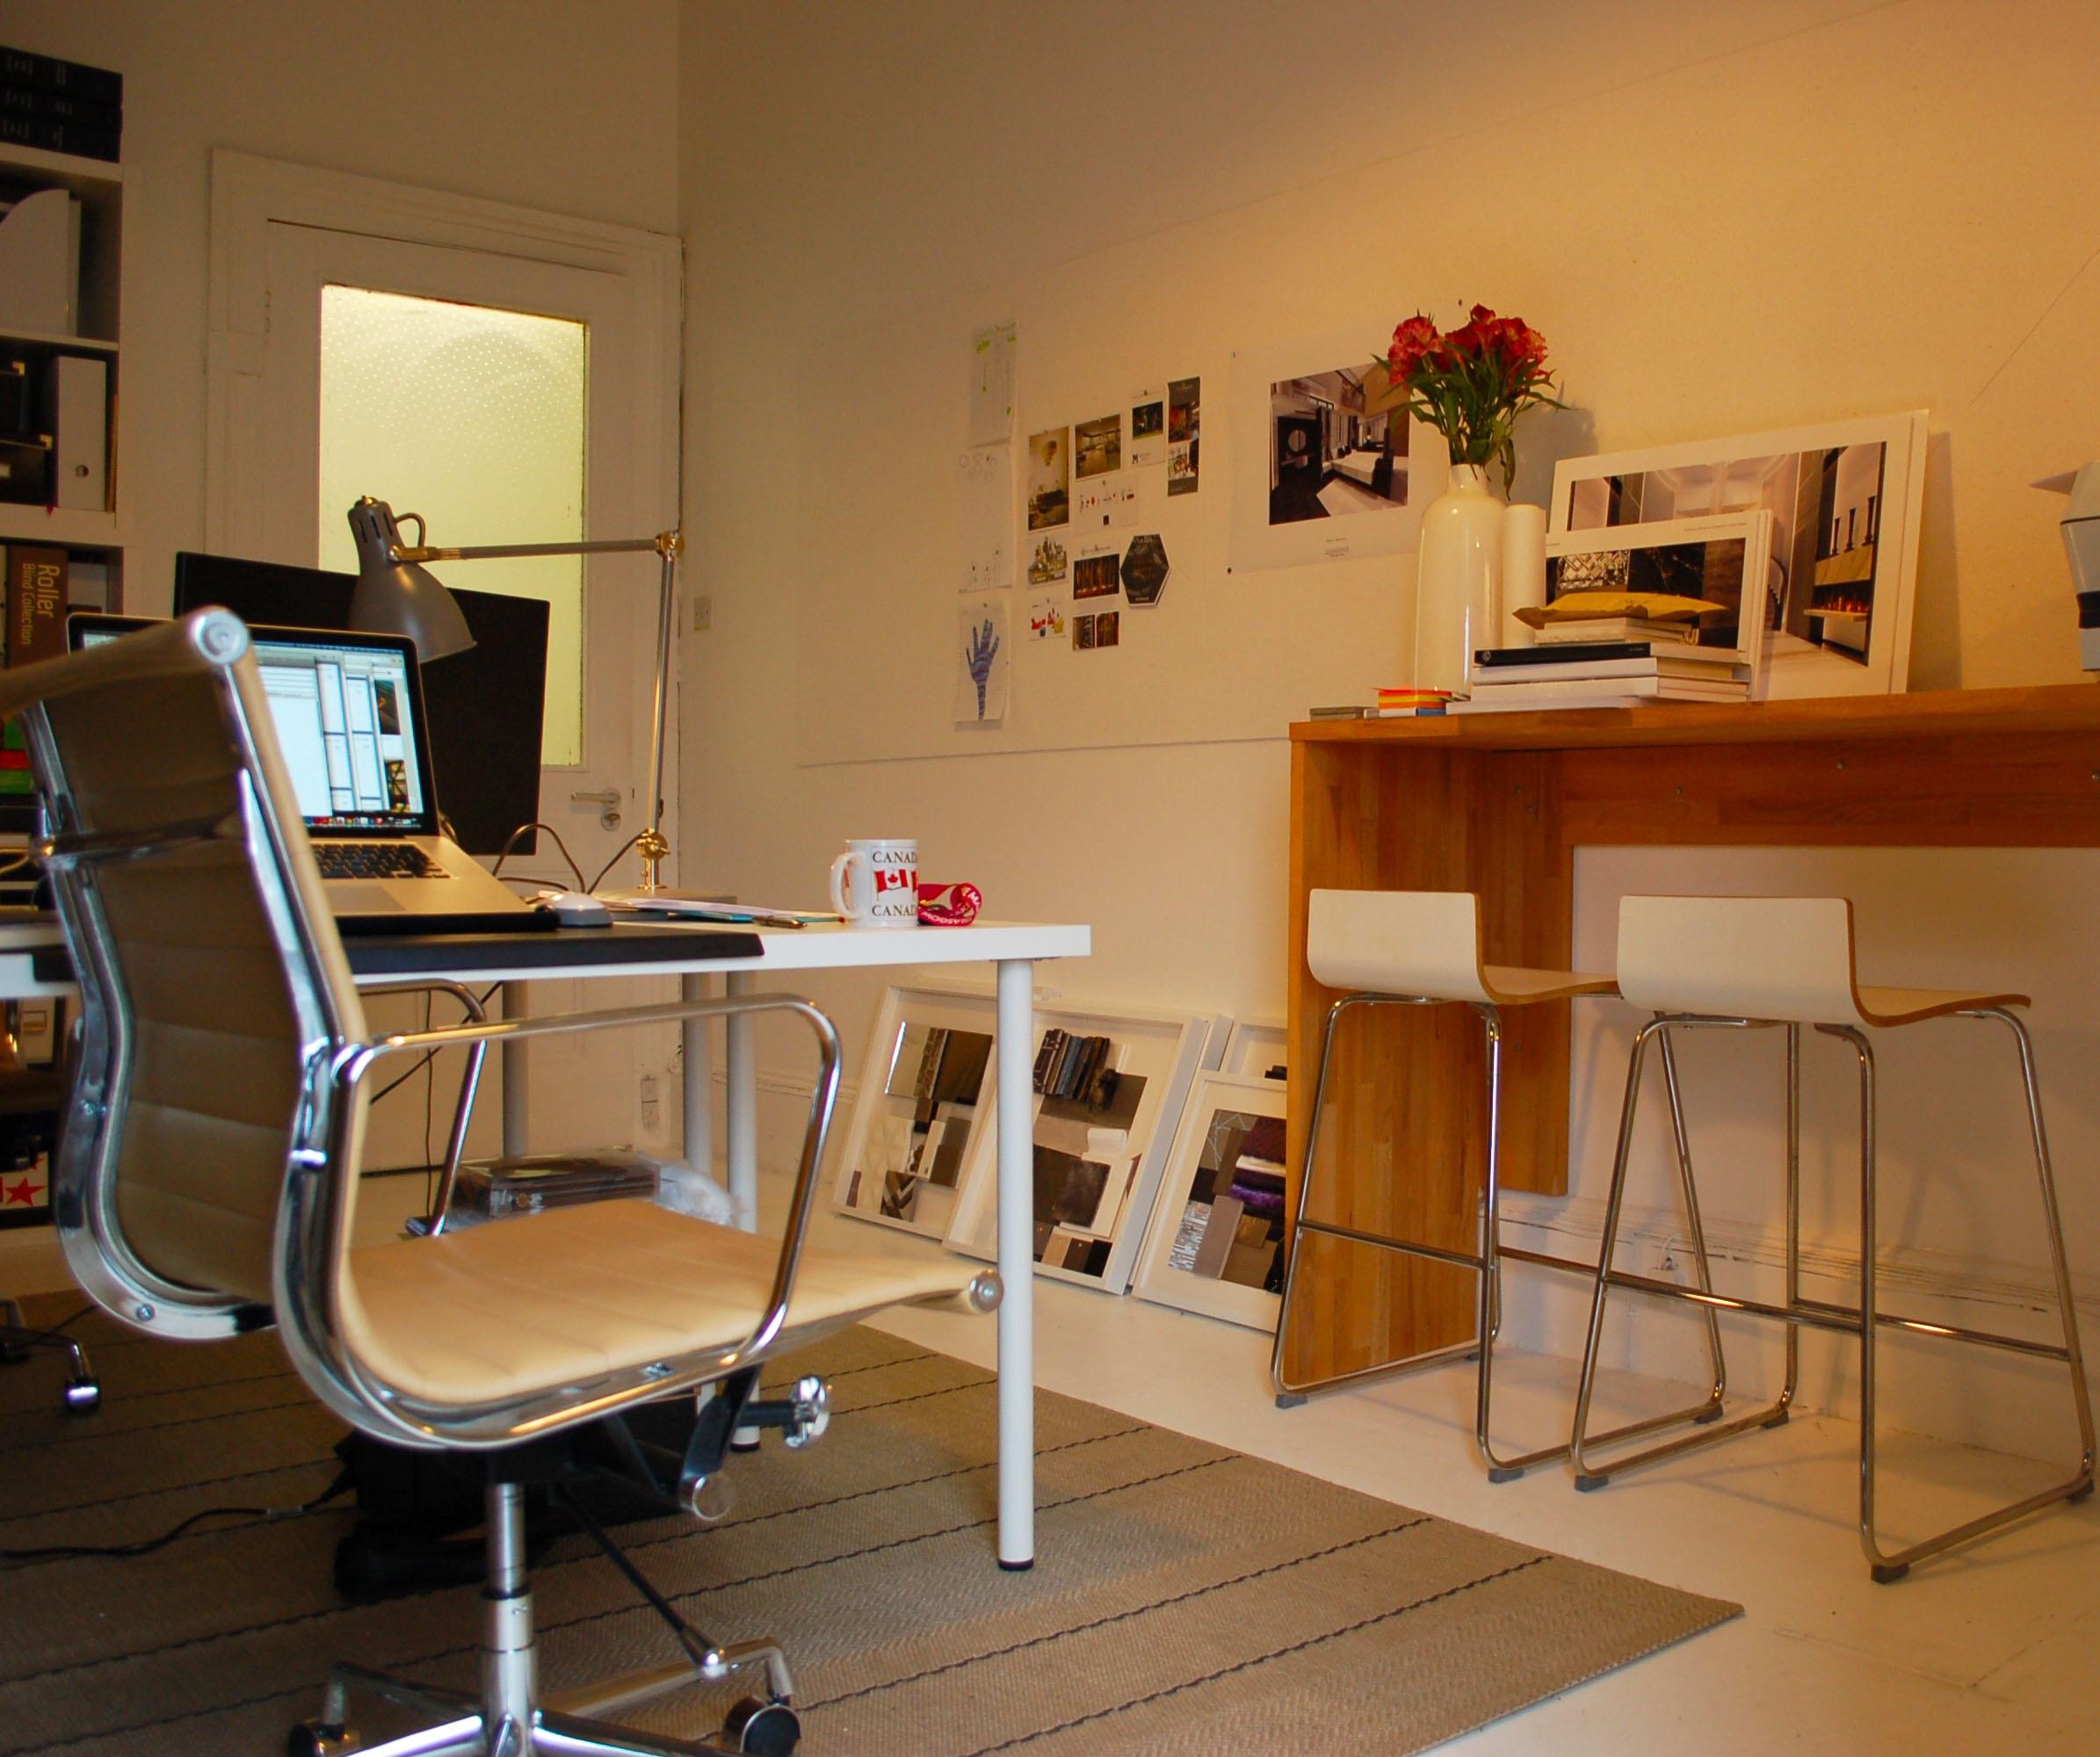 Fotos Gratis : Ordenador Portátil, Escritorio, Mesa